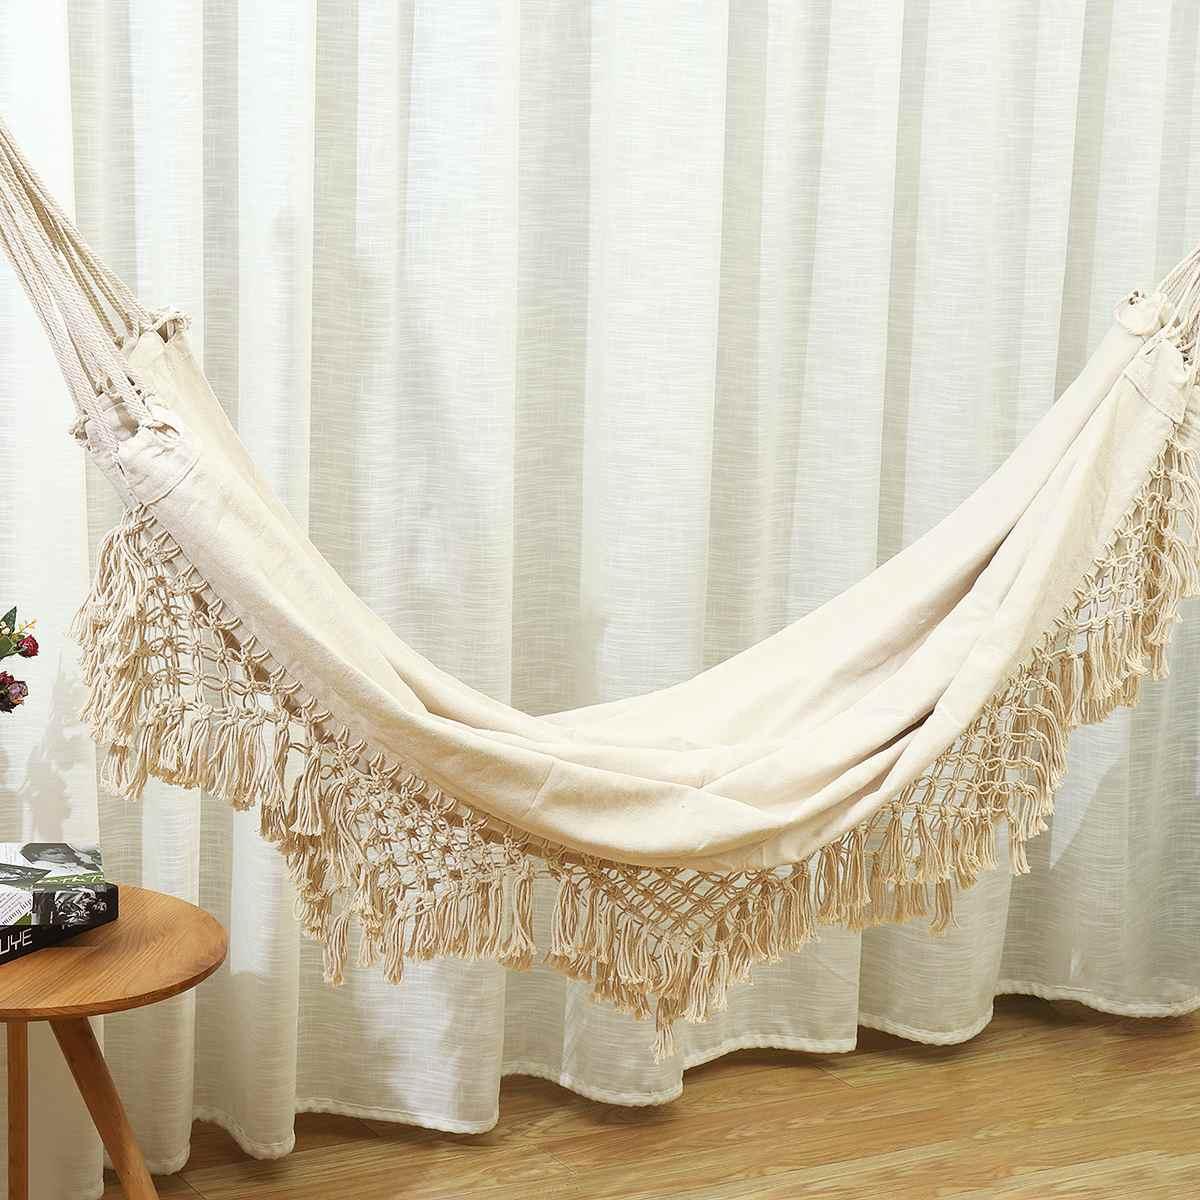 2 Person Hammock Large Brazilian Macrame Fringe Double Hammock Swing Net Chair Out/Indoor Hanging Hammock Swings(China)